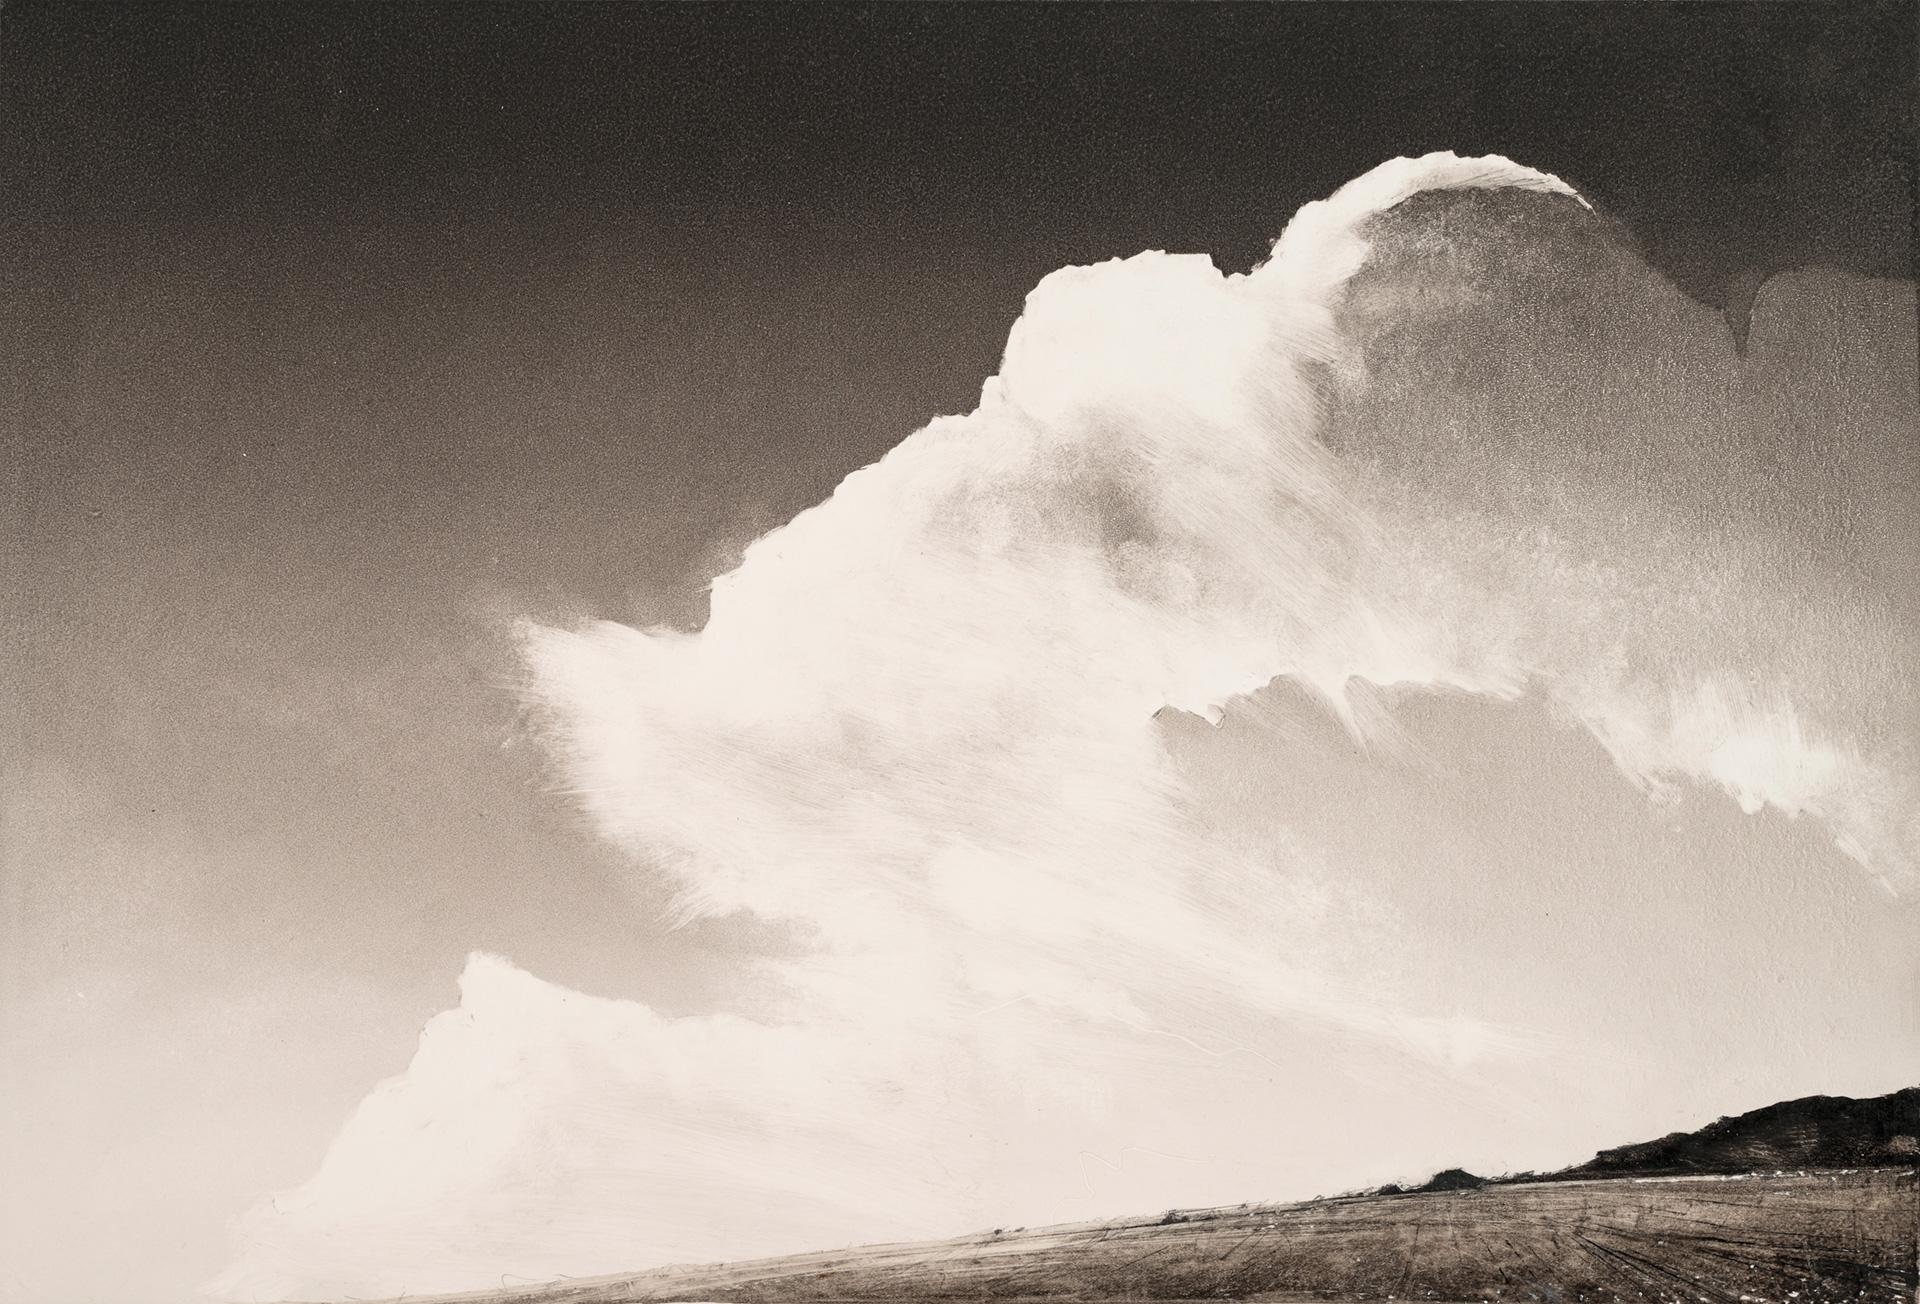 WA Cumulus - Wendy Orvile